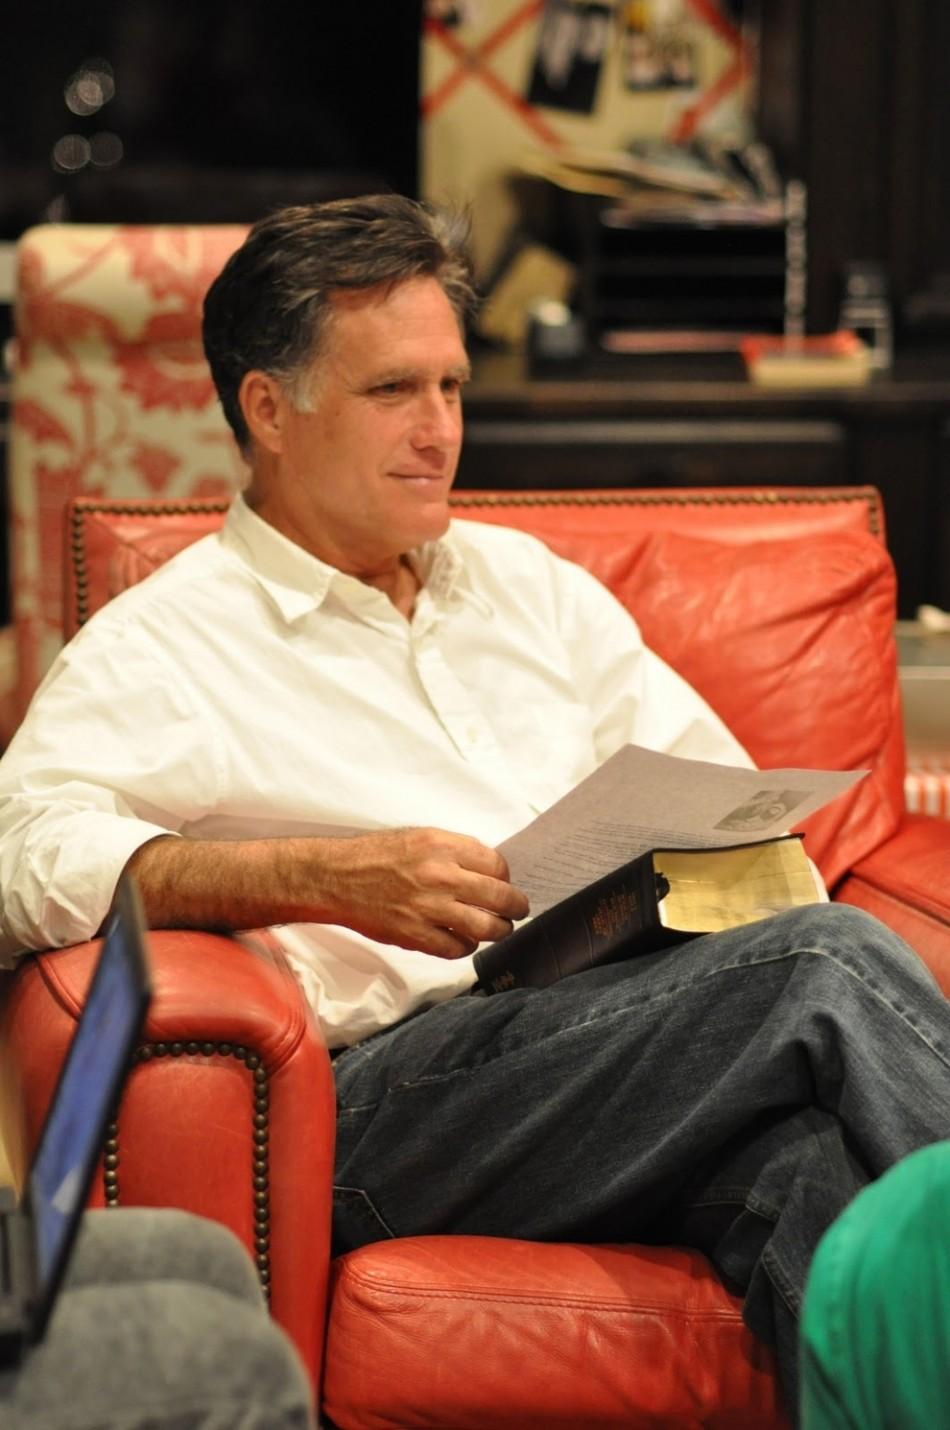 Mitt Romney Wins Arizona, But Michigan True Test of Race